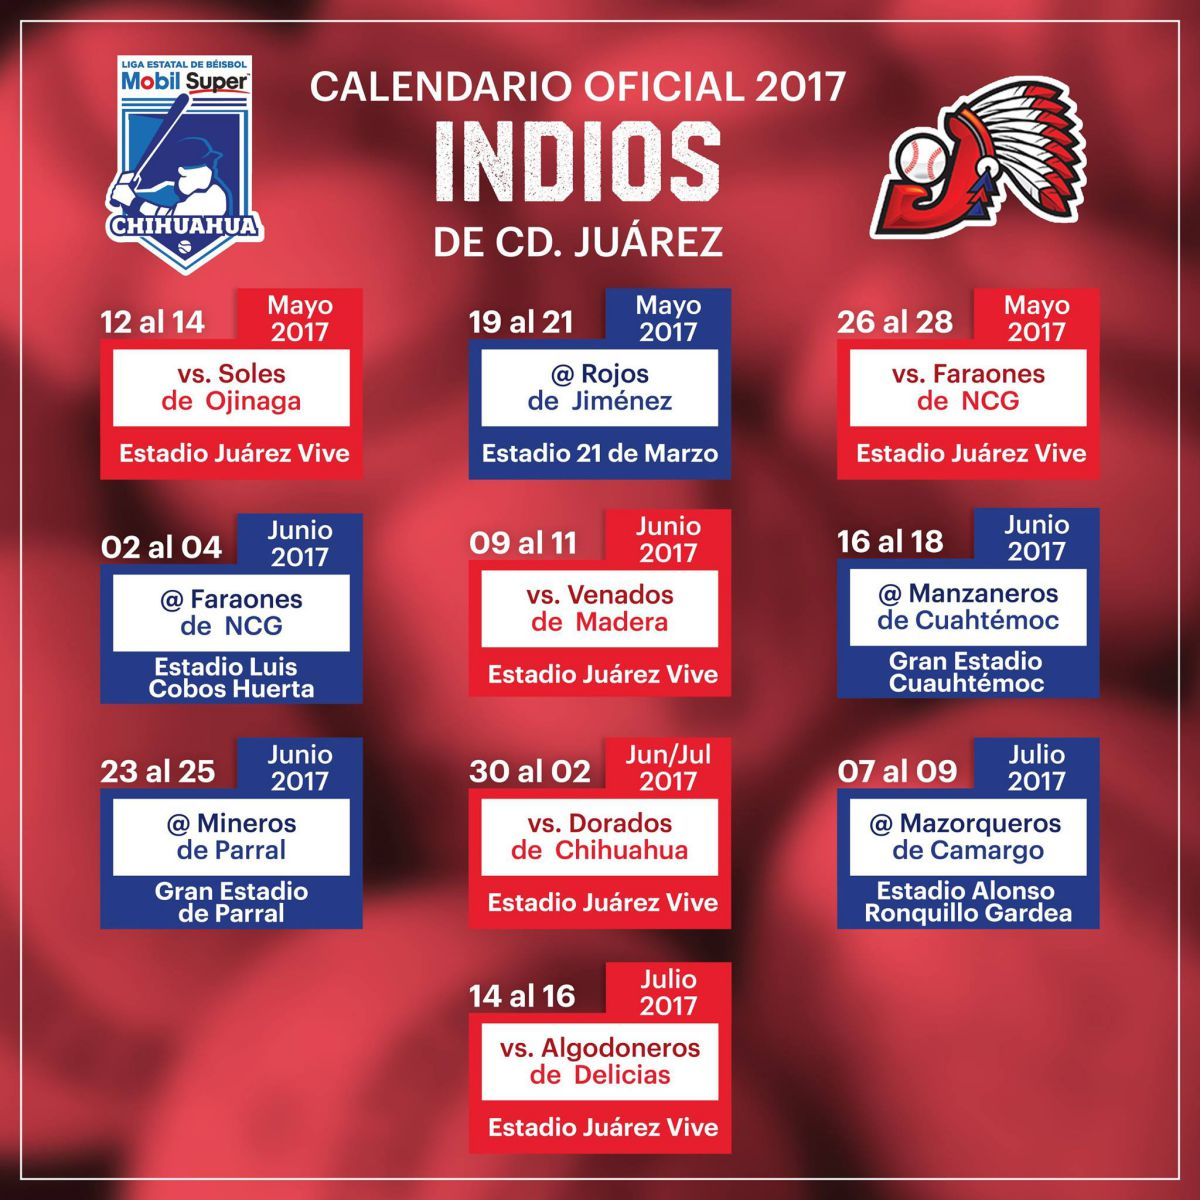 indios calendario beisbol chihuahua 2017